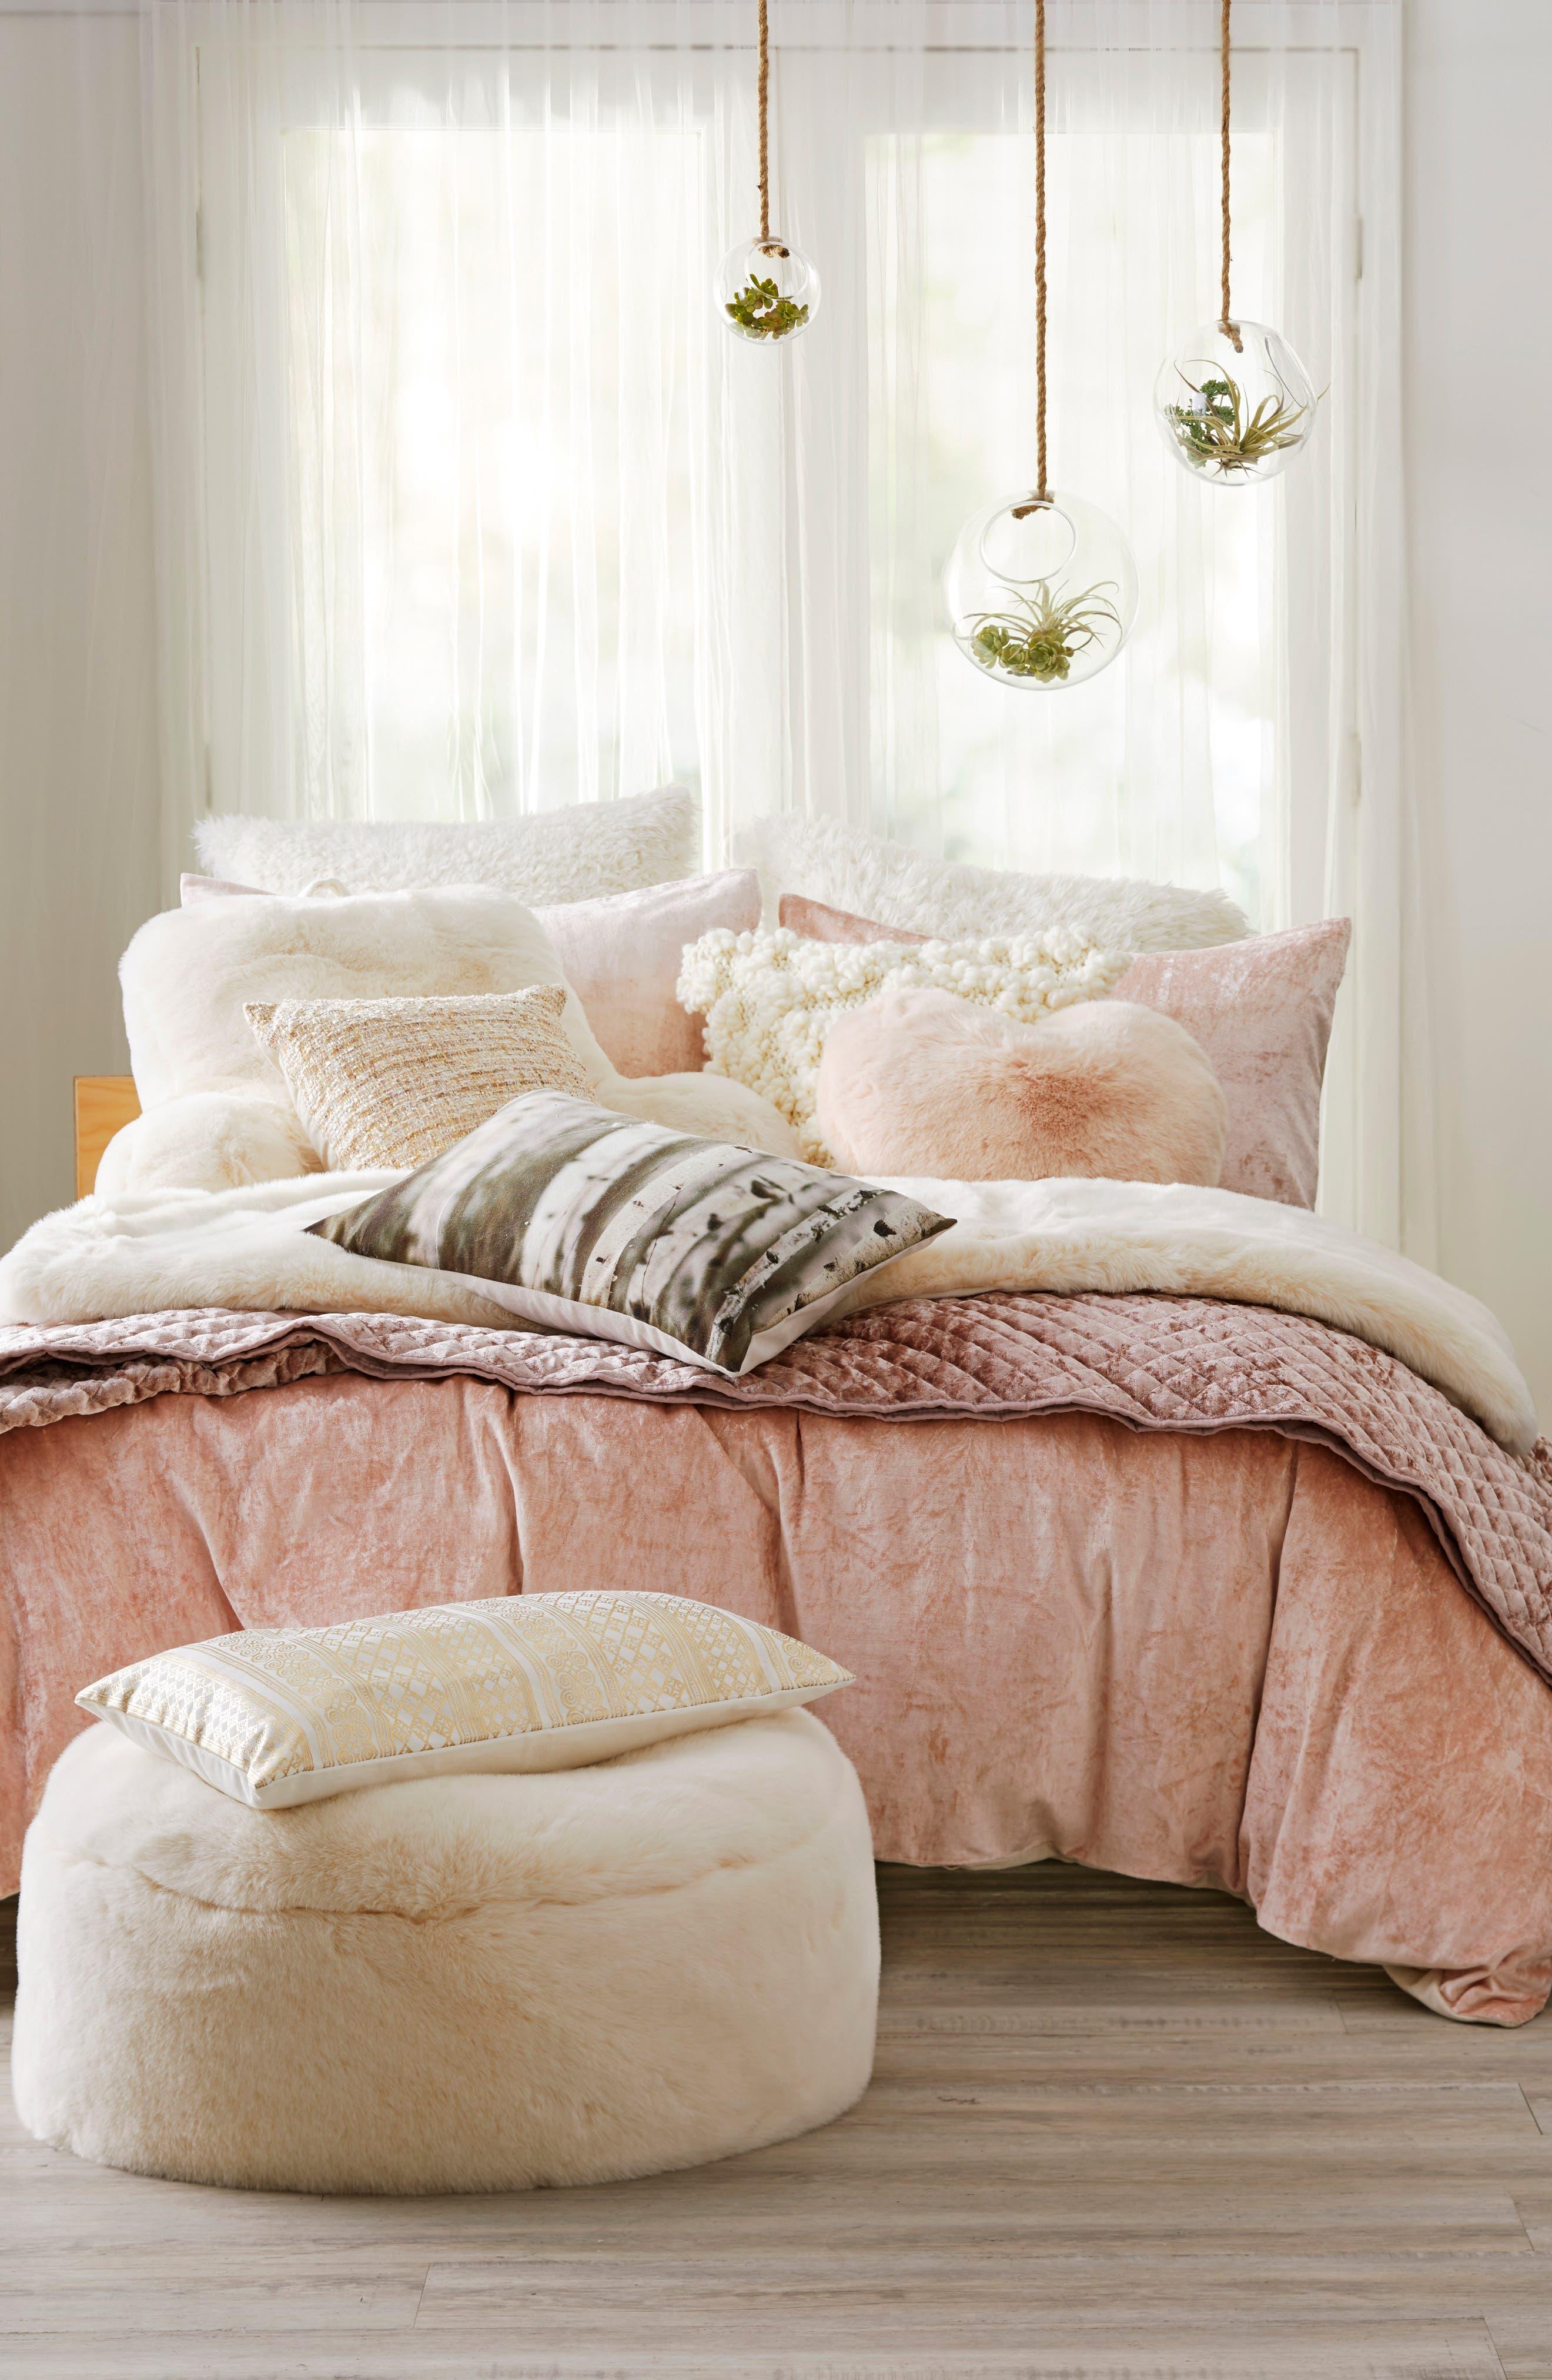 Nordstrom At Home Shimmer Velvet Duvet U0026 Levtex Crushed Velvet Quilt  Bedding Collection